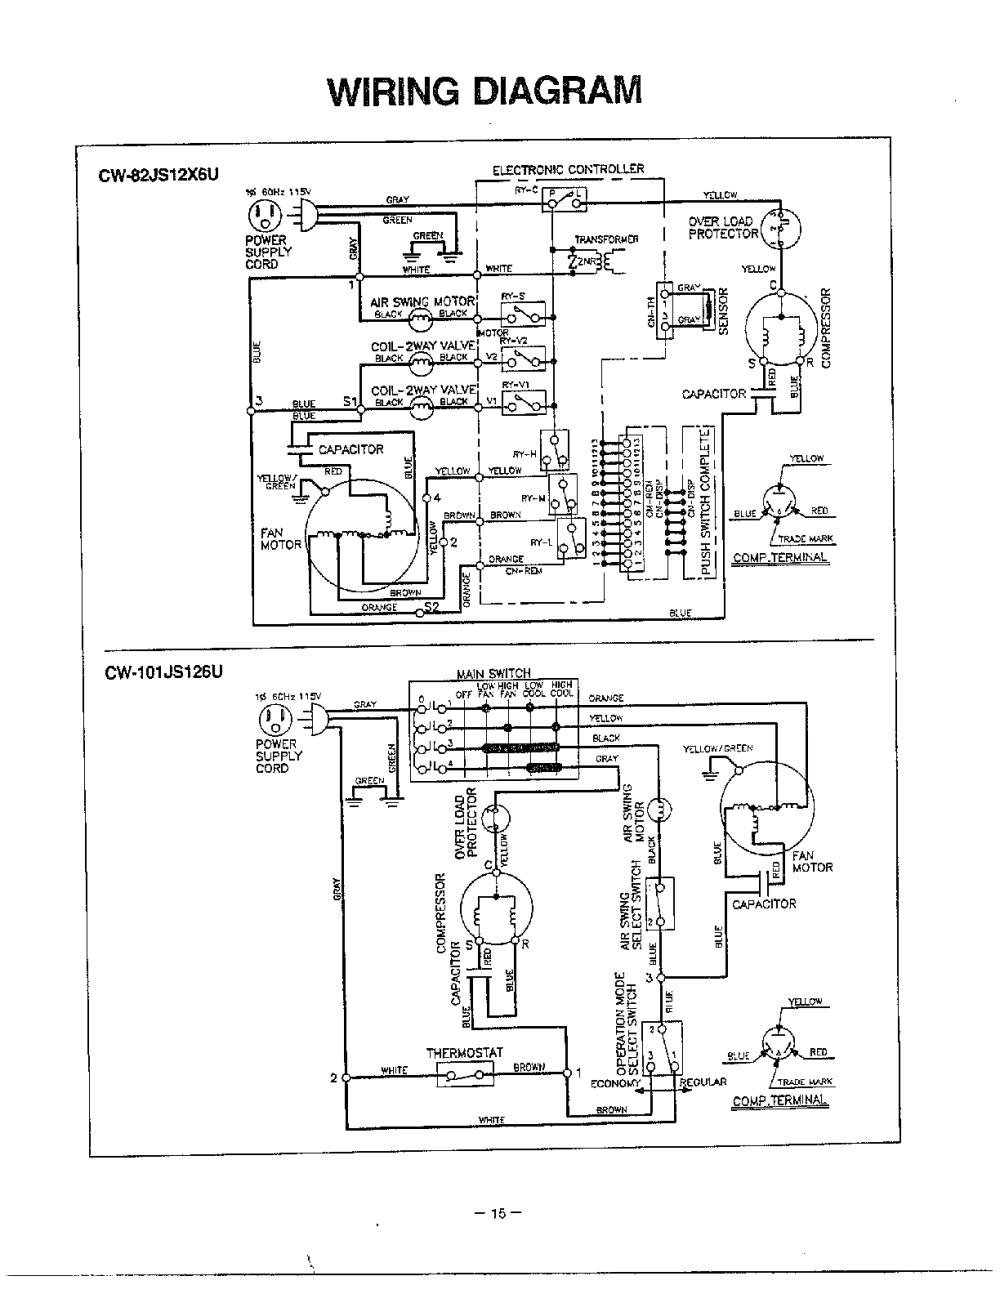 medium resolution of panasonic window type aircon wiring diagram